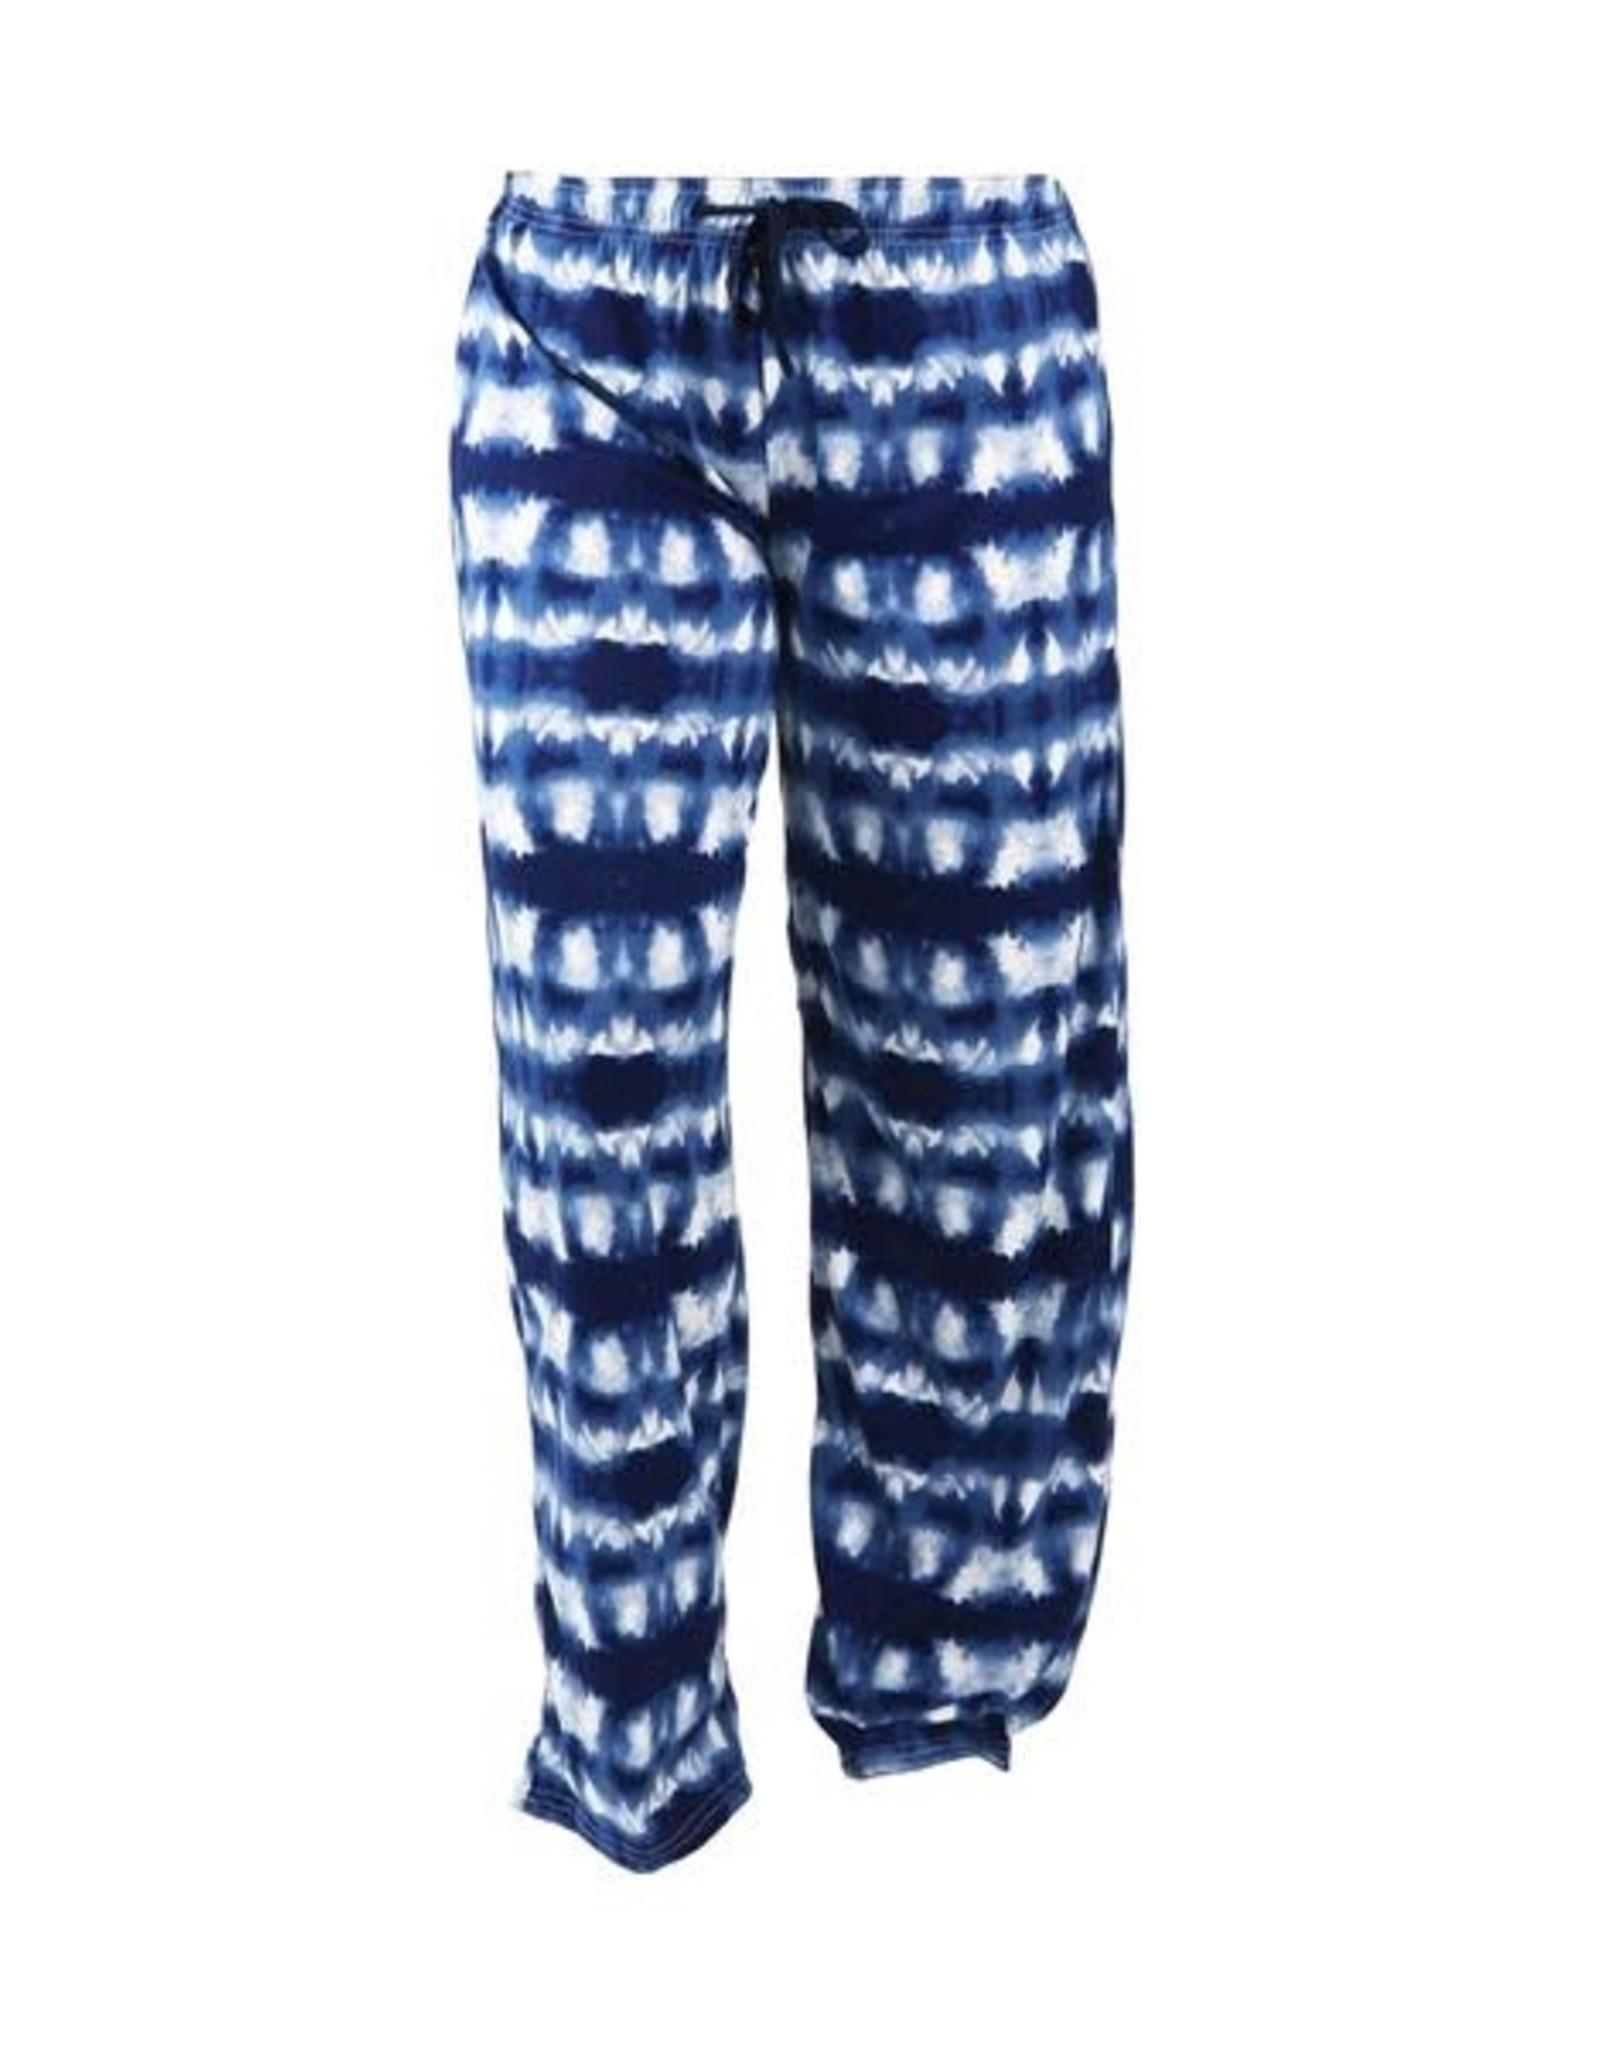 Lounge Pants - Daydream, Large/XLarge